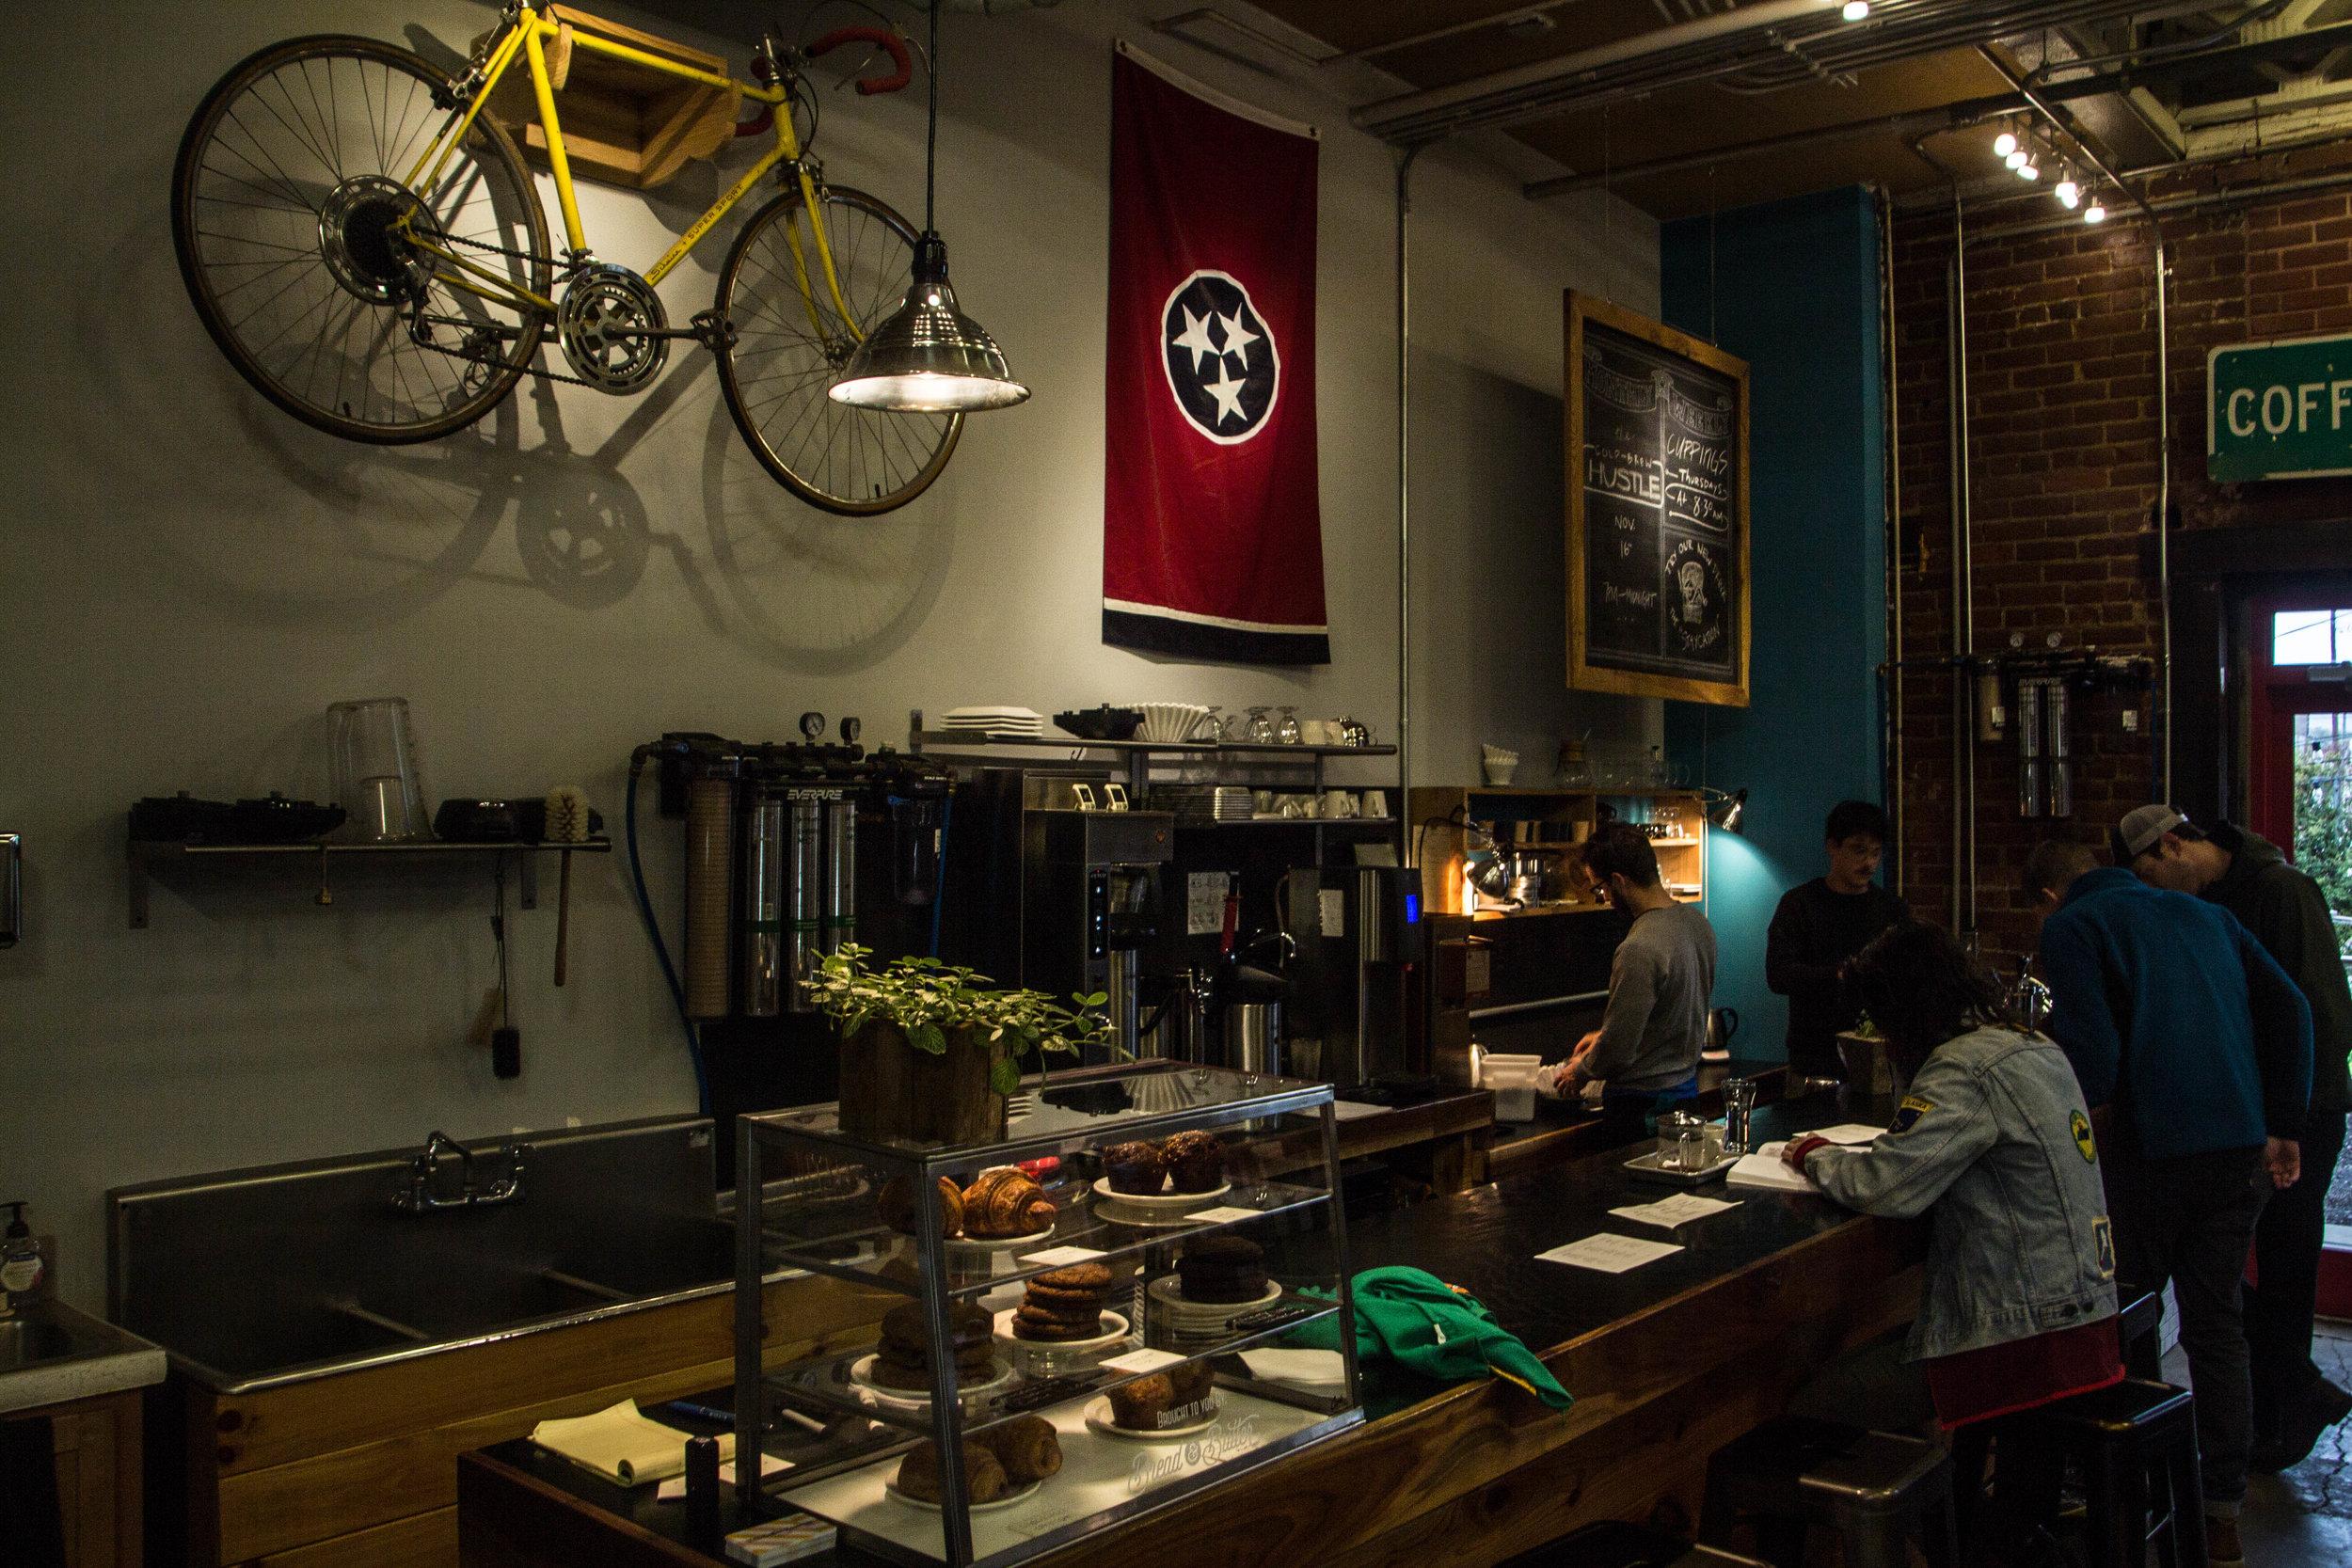 velo-coffee-chattanooga-tennessee-5.jpg